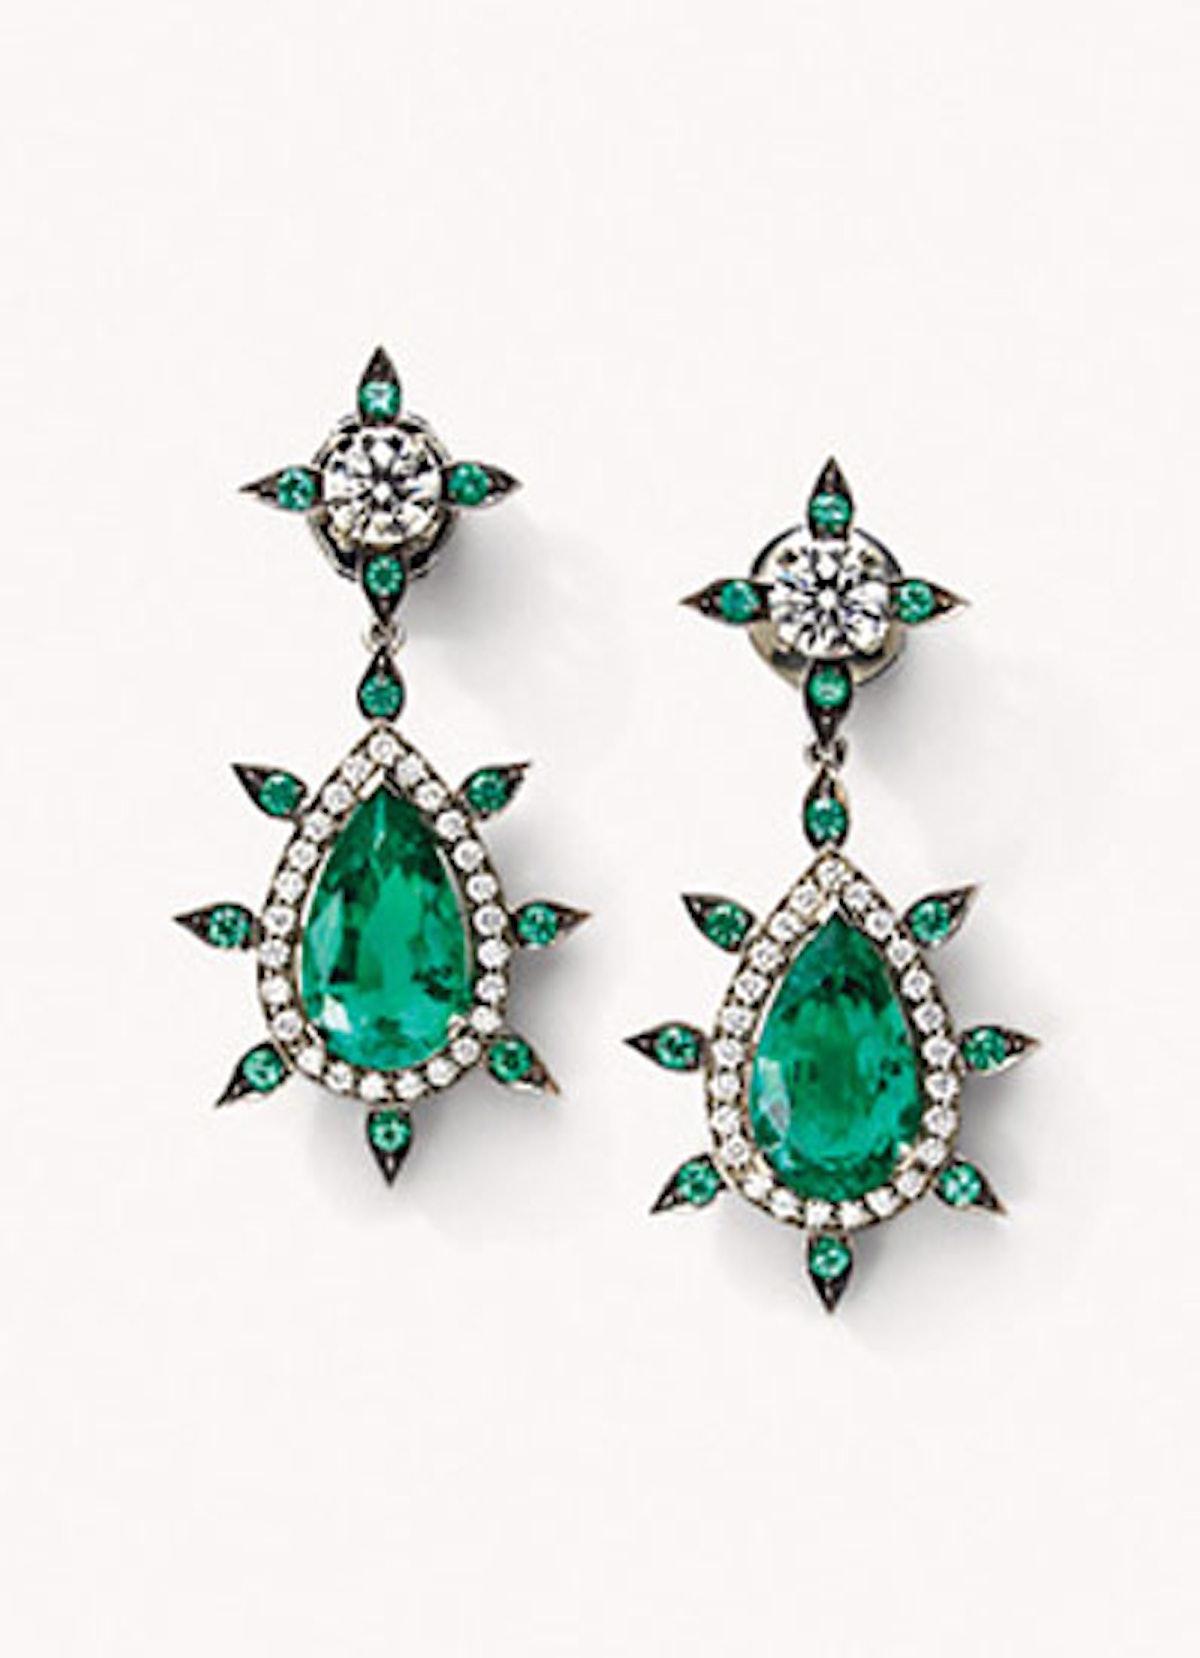 acss-claudia-mata-jewelry-picks-01-v.jpg